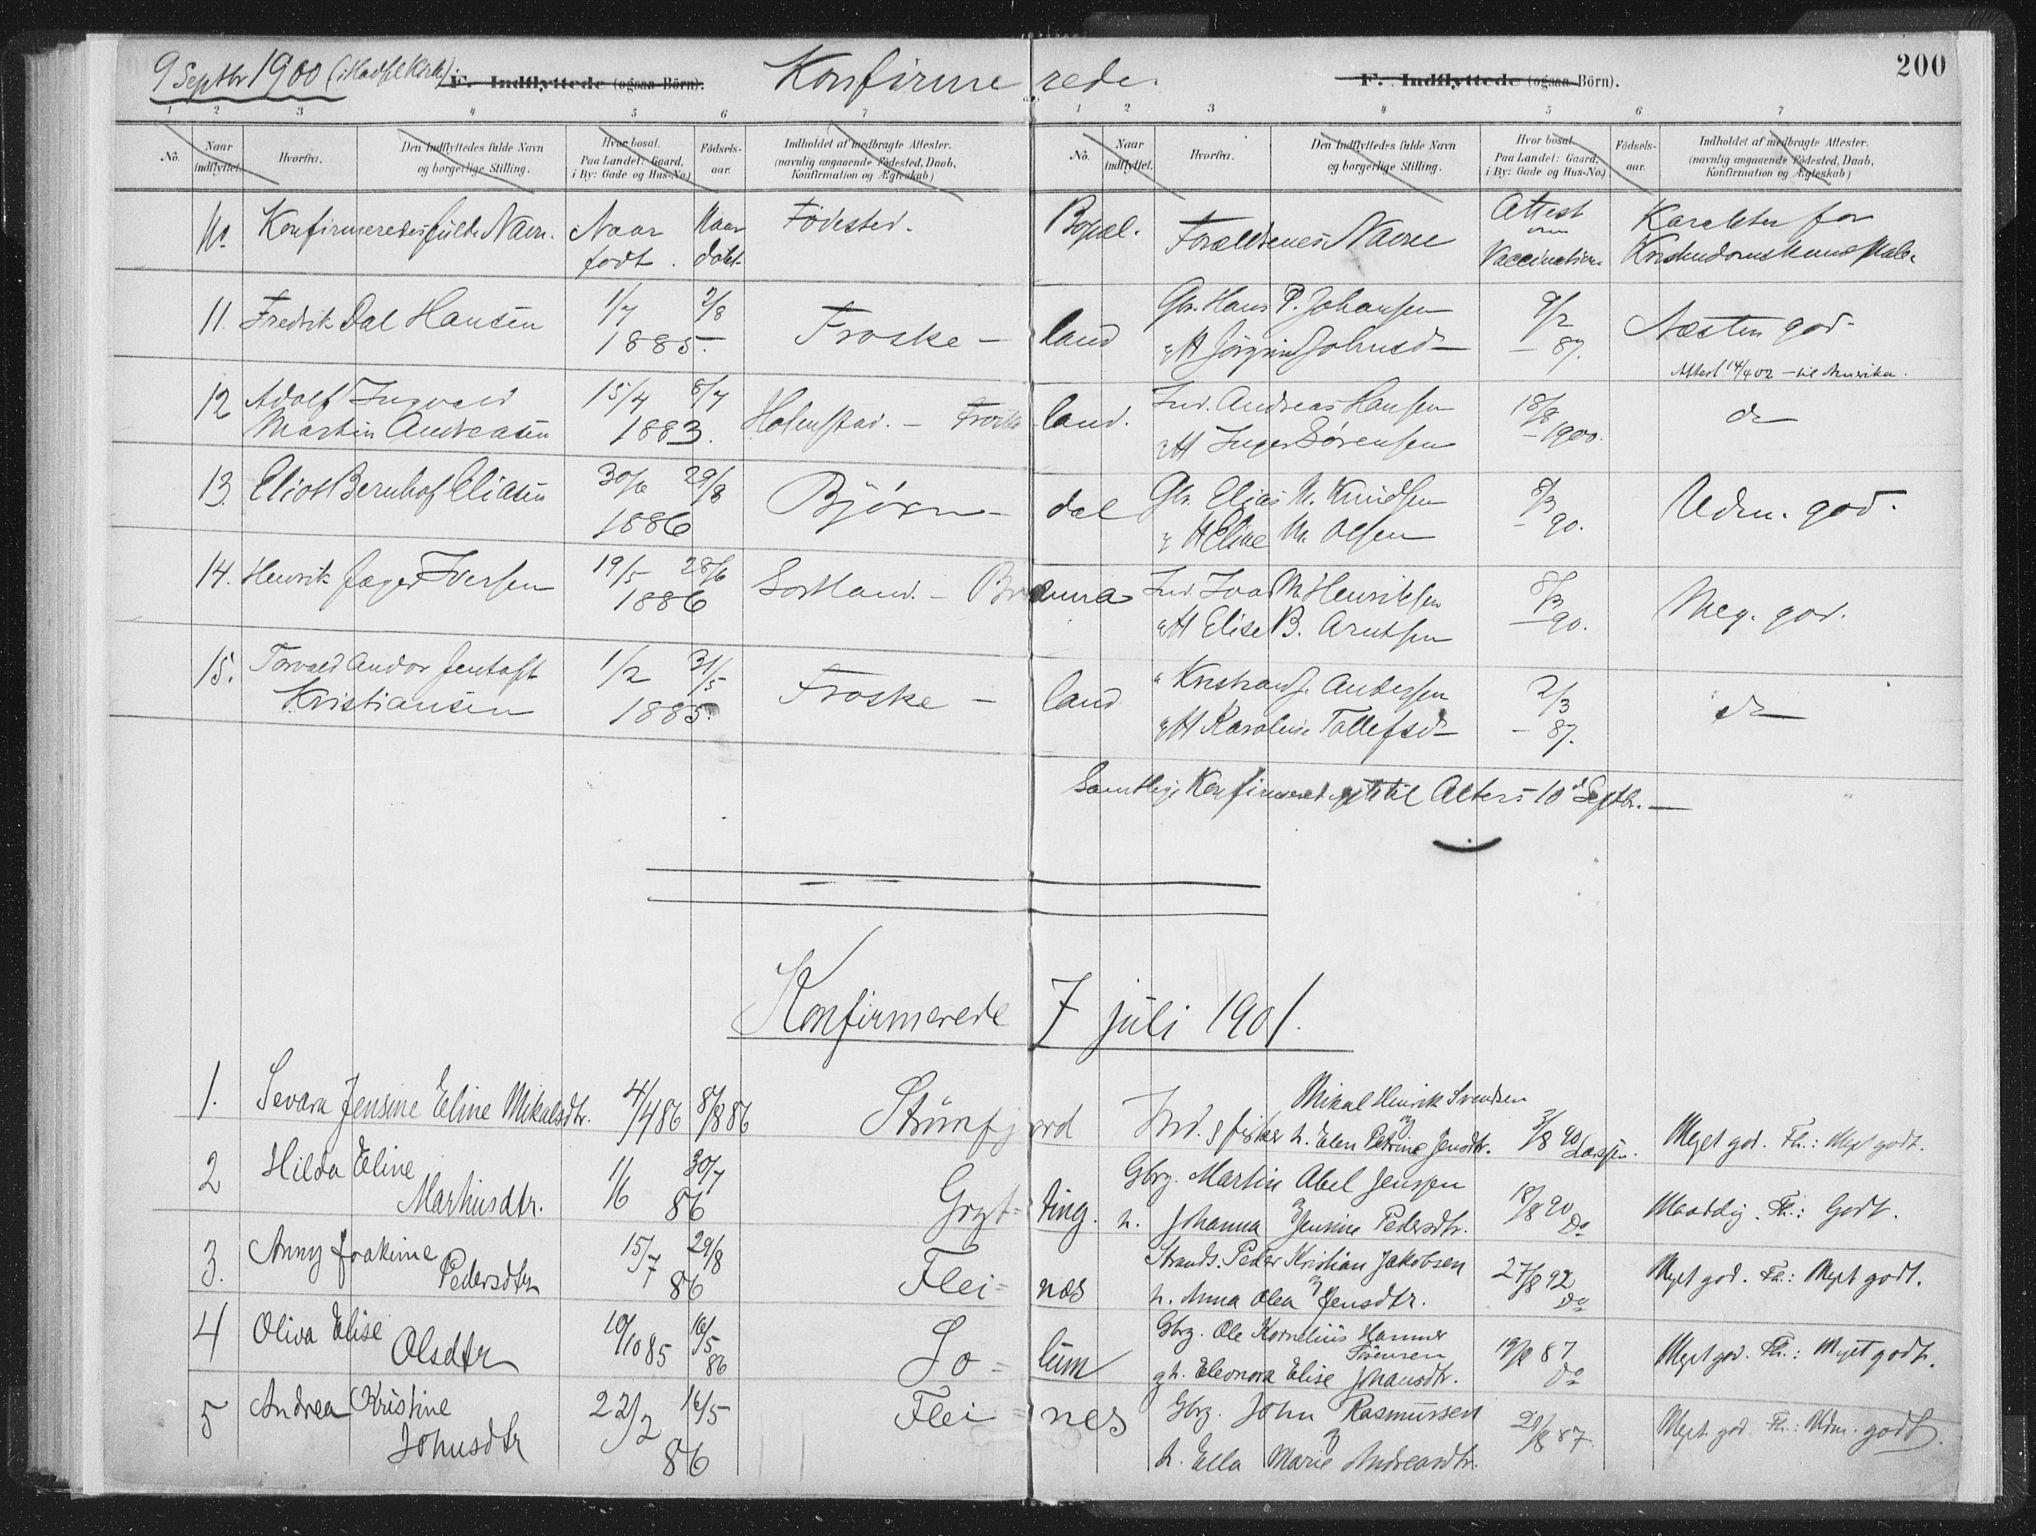 SAT, Ministerialprotokoller, klokkerbøker og fødselsregistre - Nordland, 890/L1286: Ministerialbok nr. 890A01, 1882-1902, s. 200